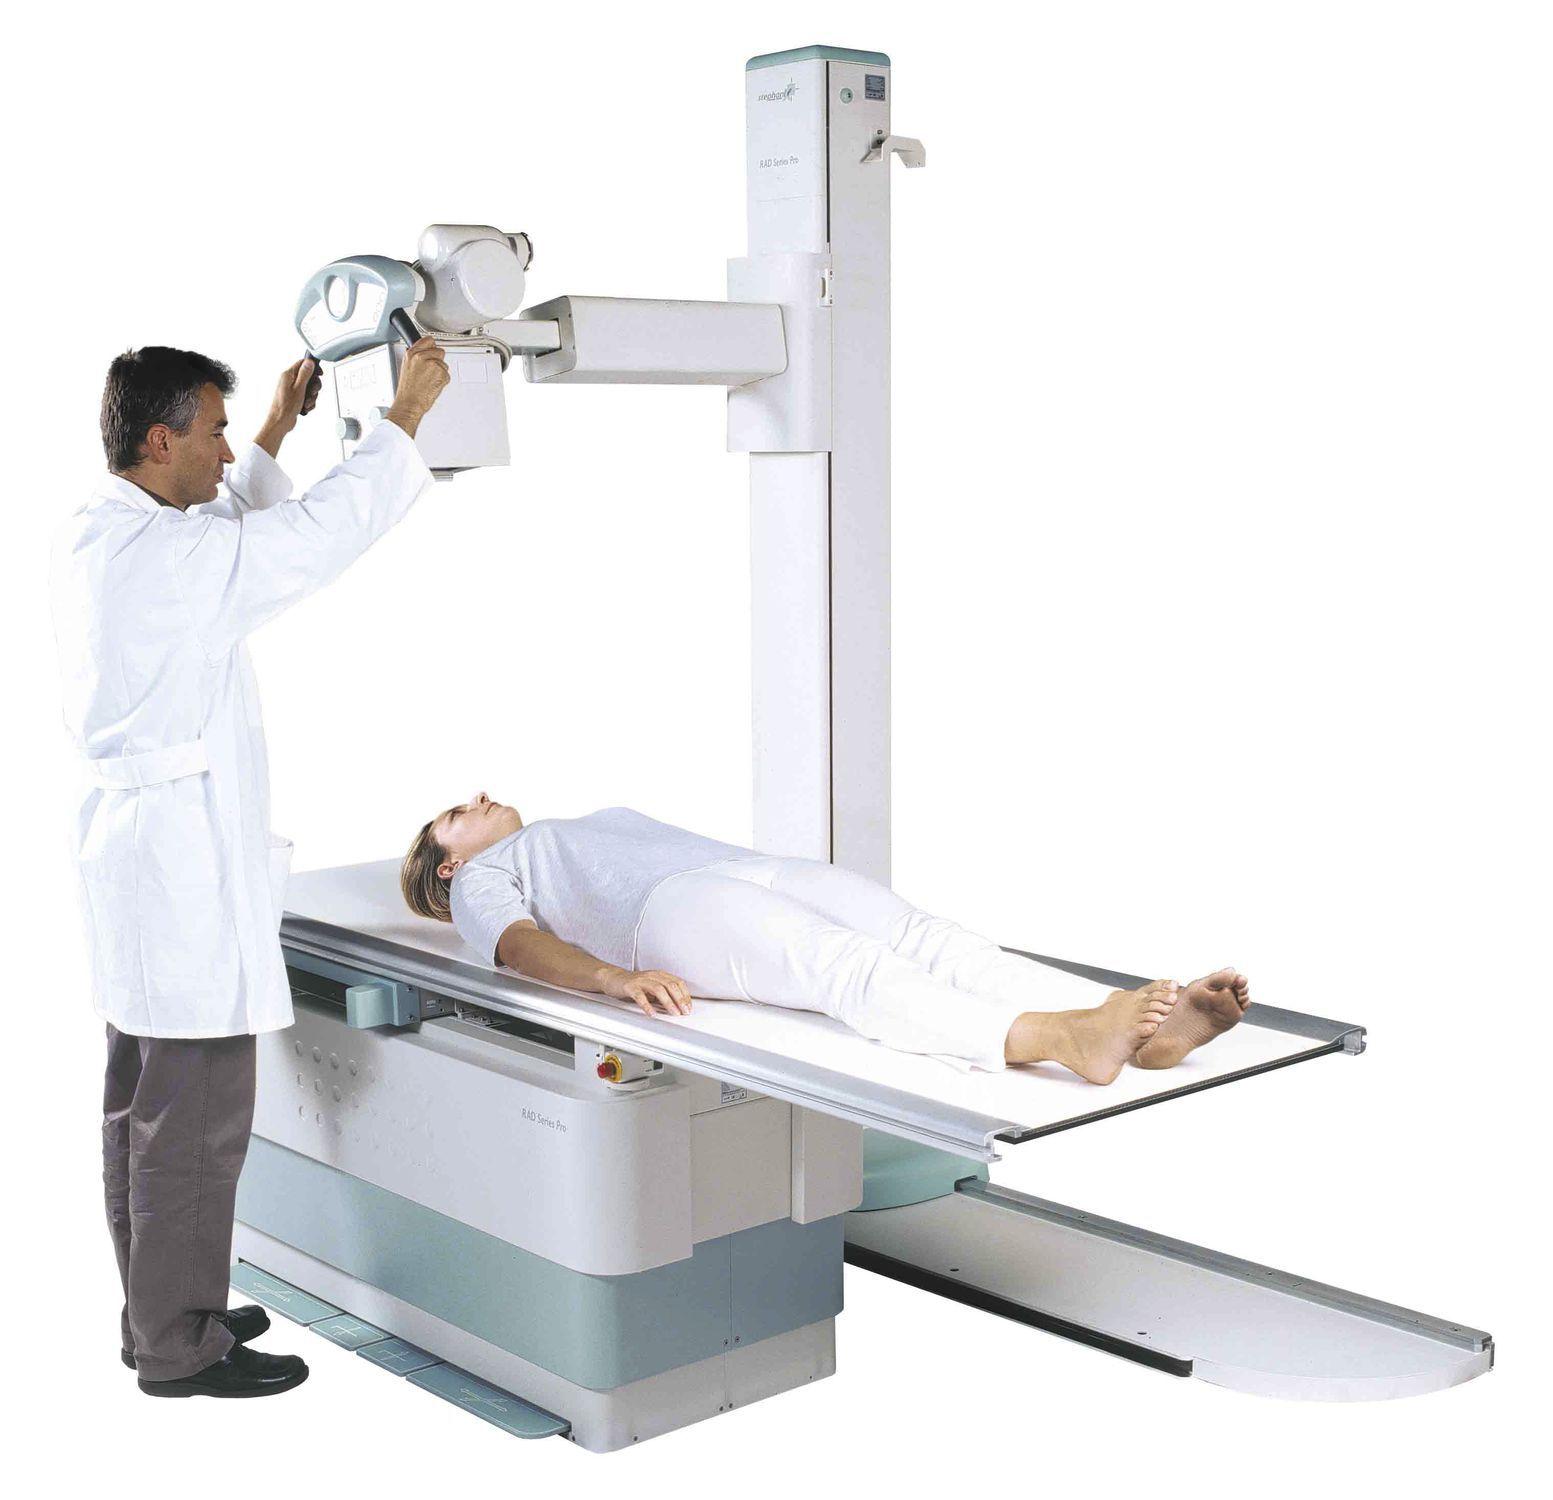 Radiography system / digital / analog / for multipurpose radiography - RAD Series Pro DReam - Stephanix